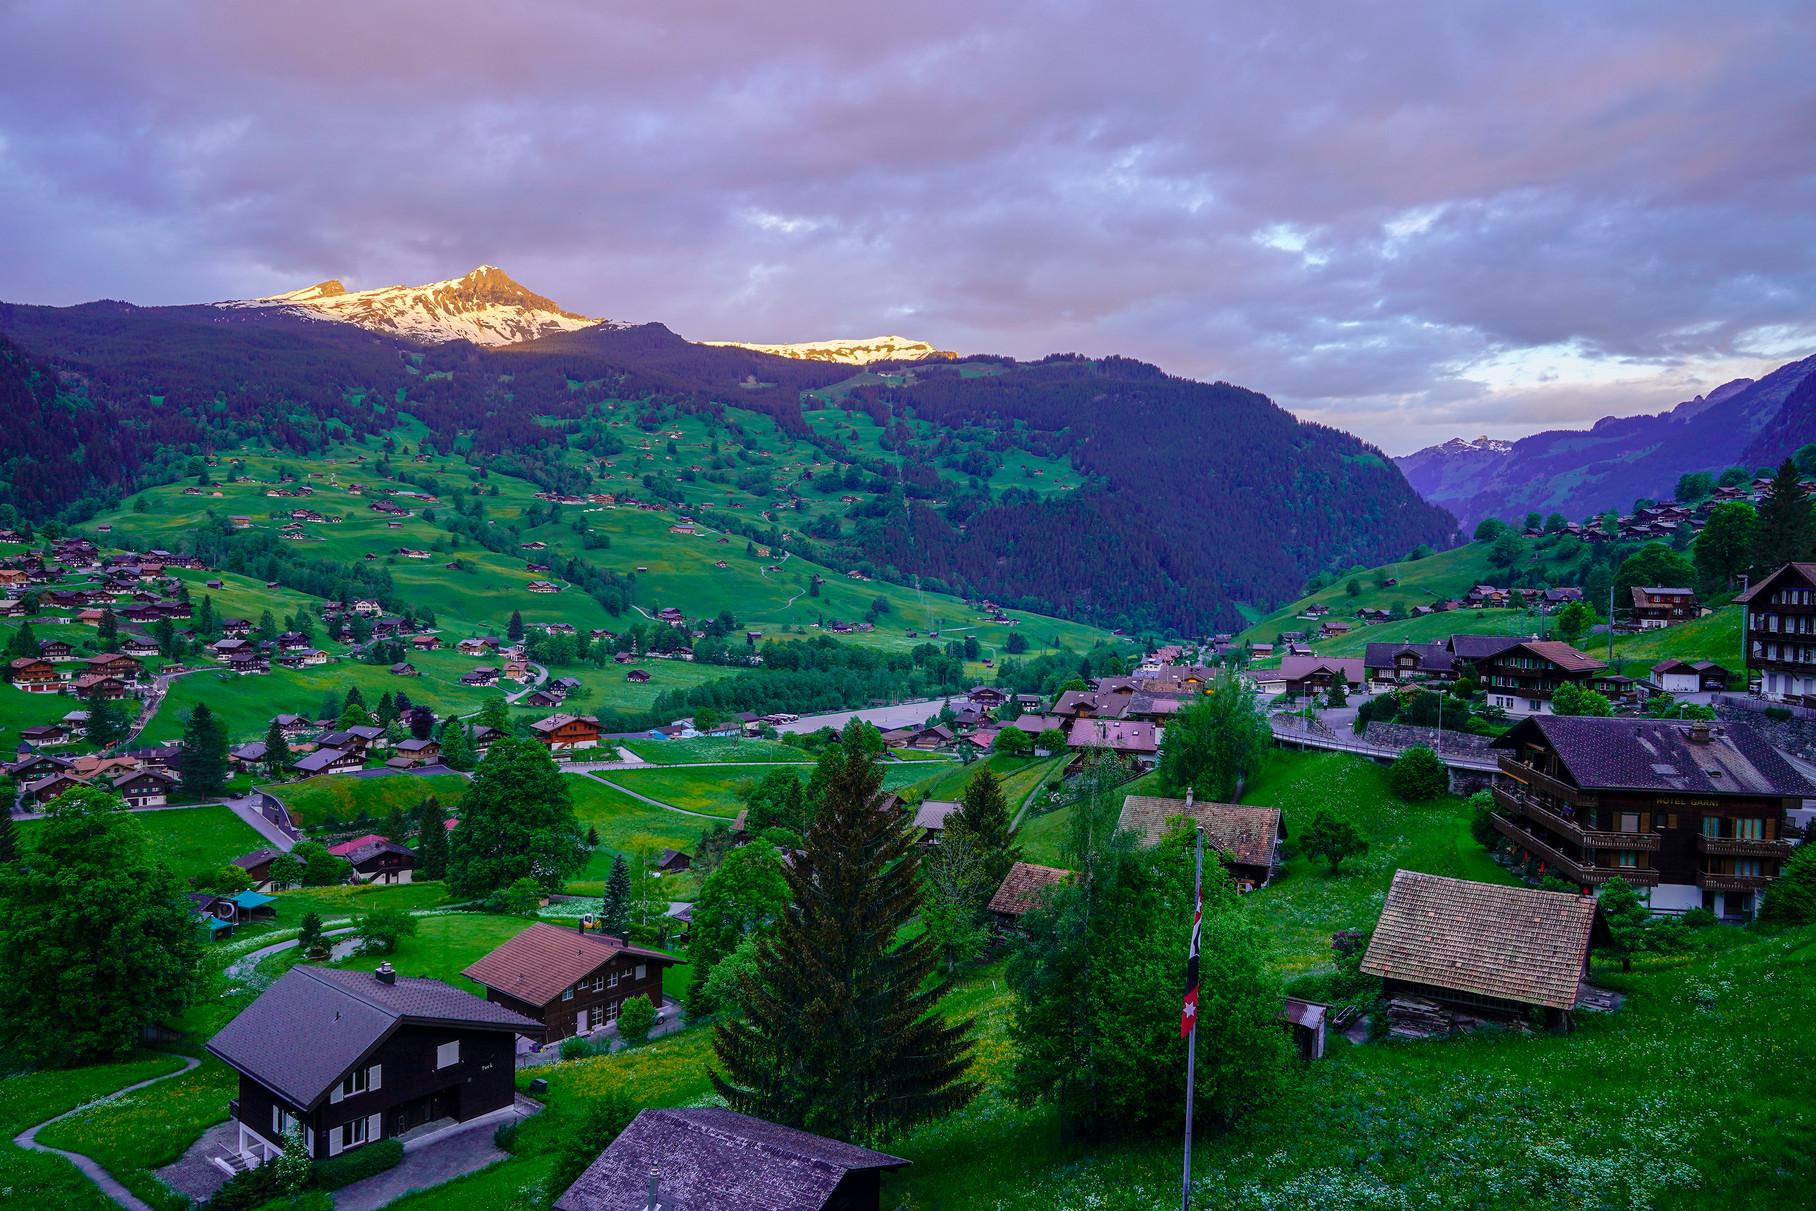 _VKS0750_Grindalwal_Switzerland.jpg